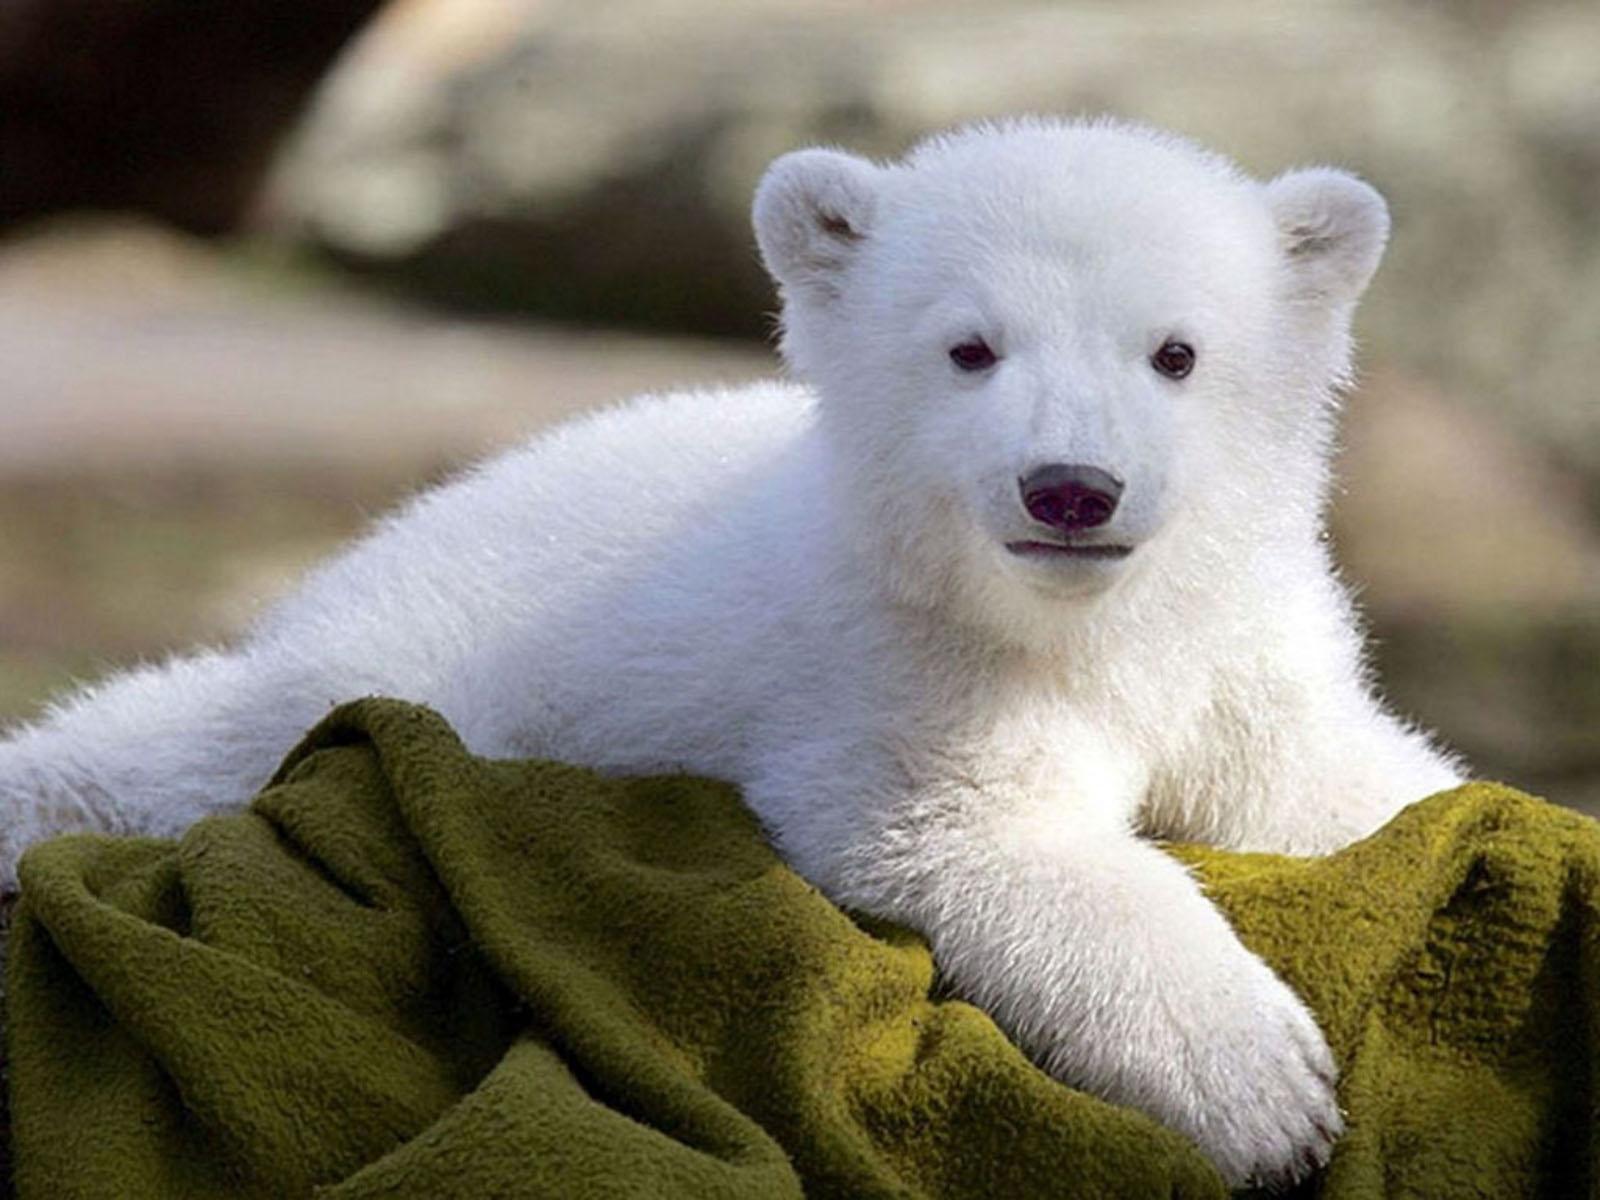 красивый милый белый медвежонок, white bear wallpaper